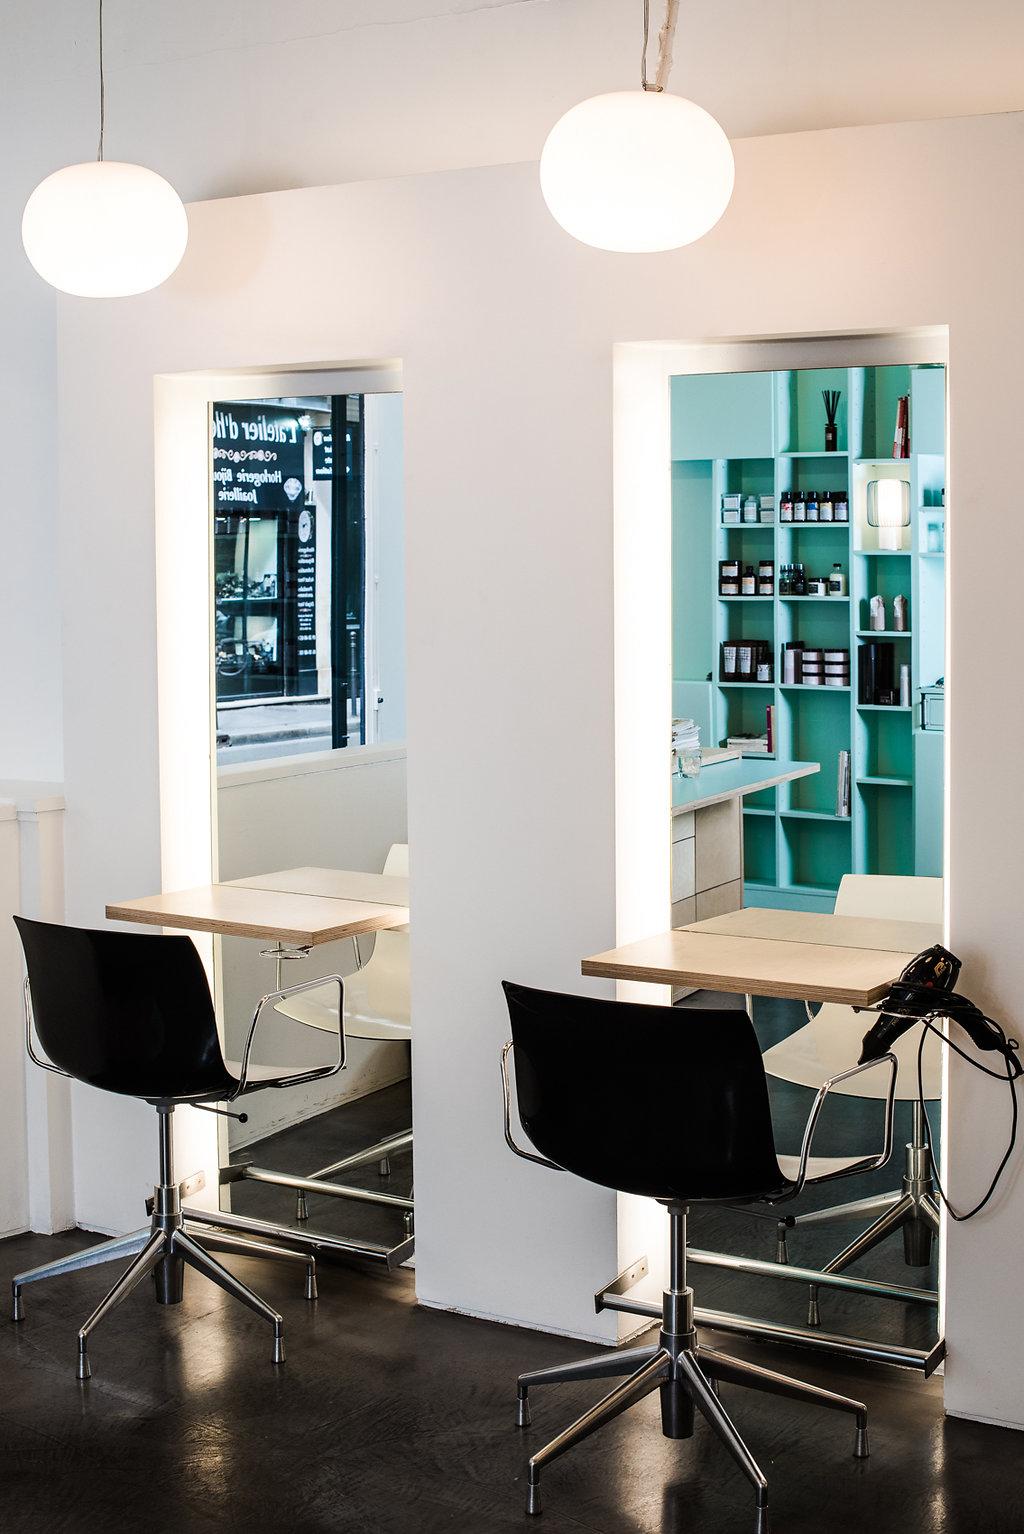 Le salon, espace coiffure